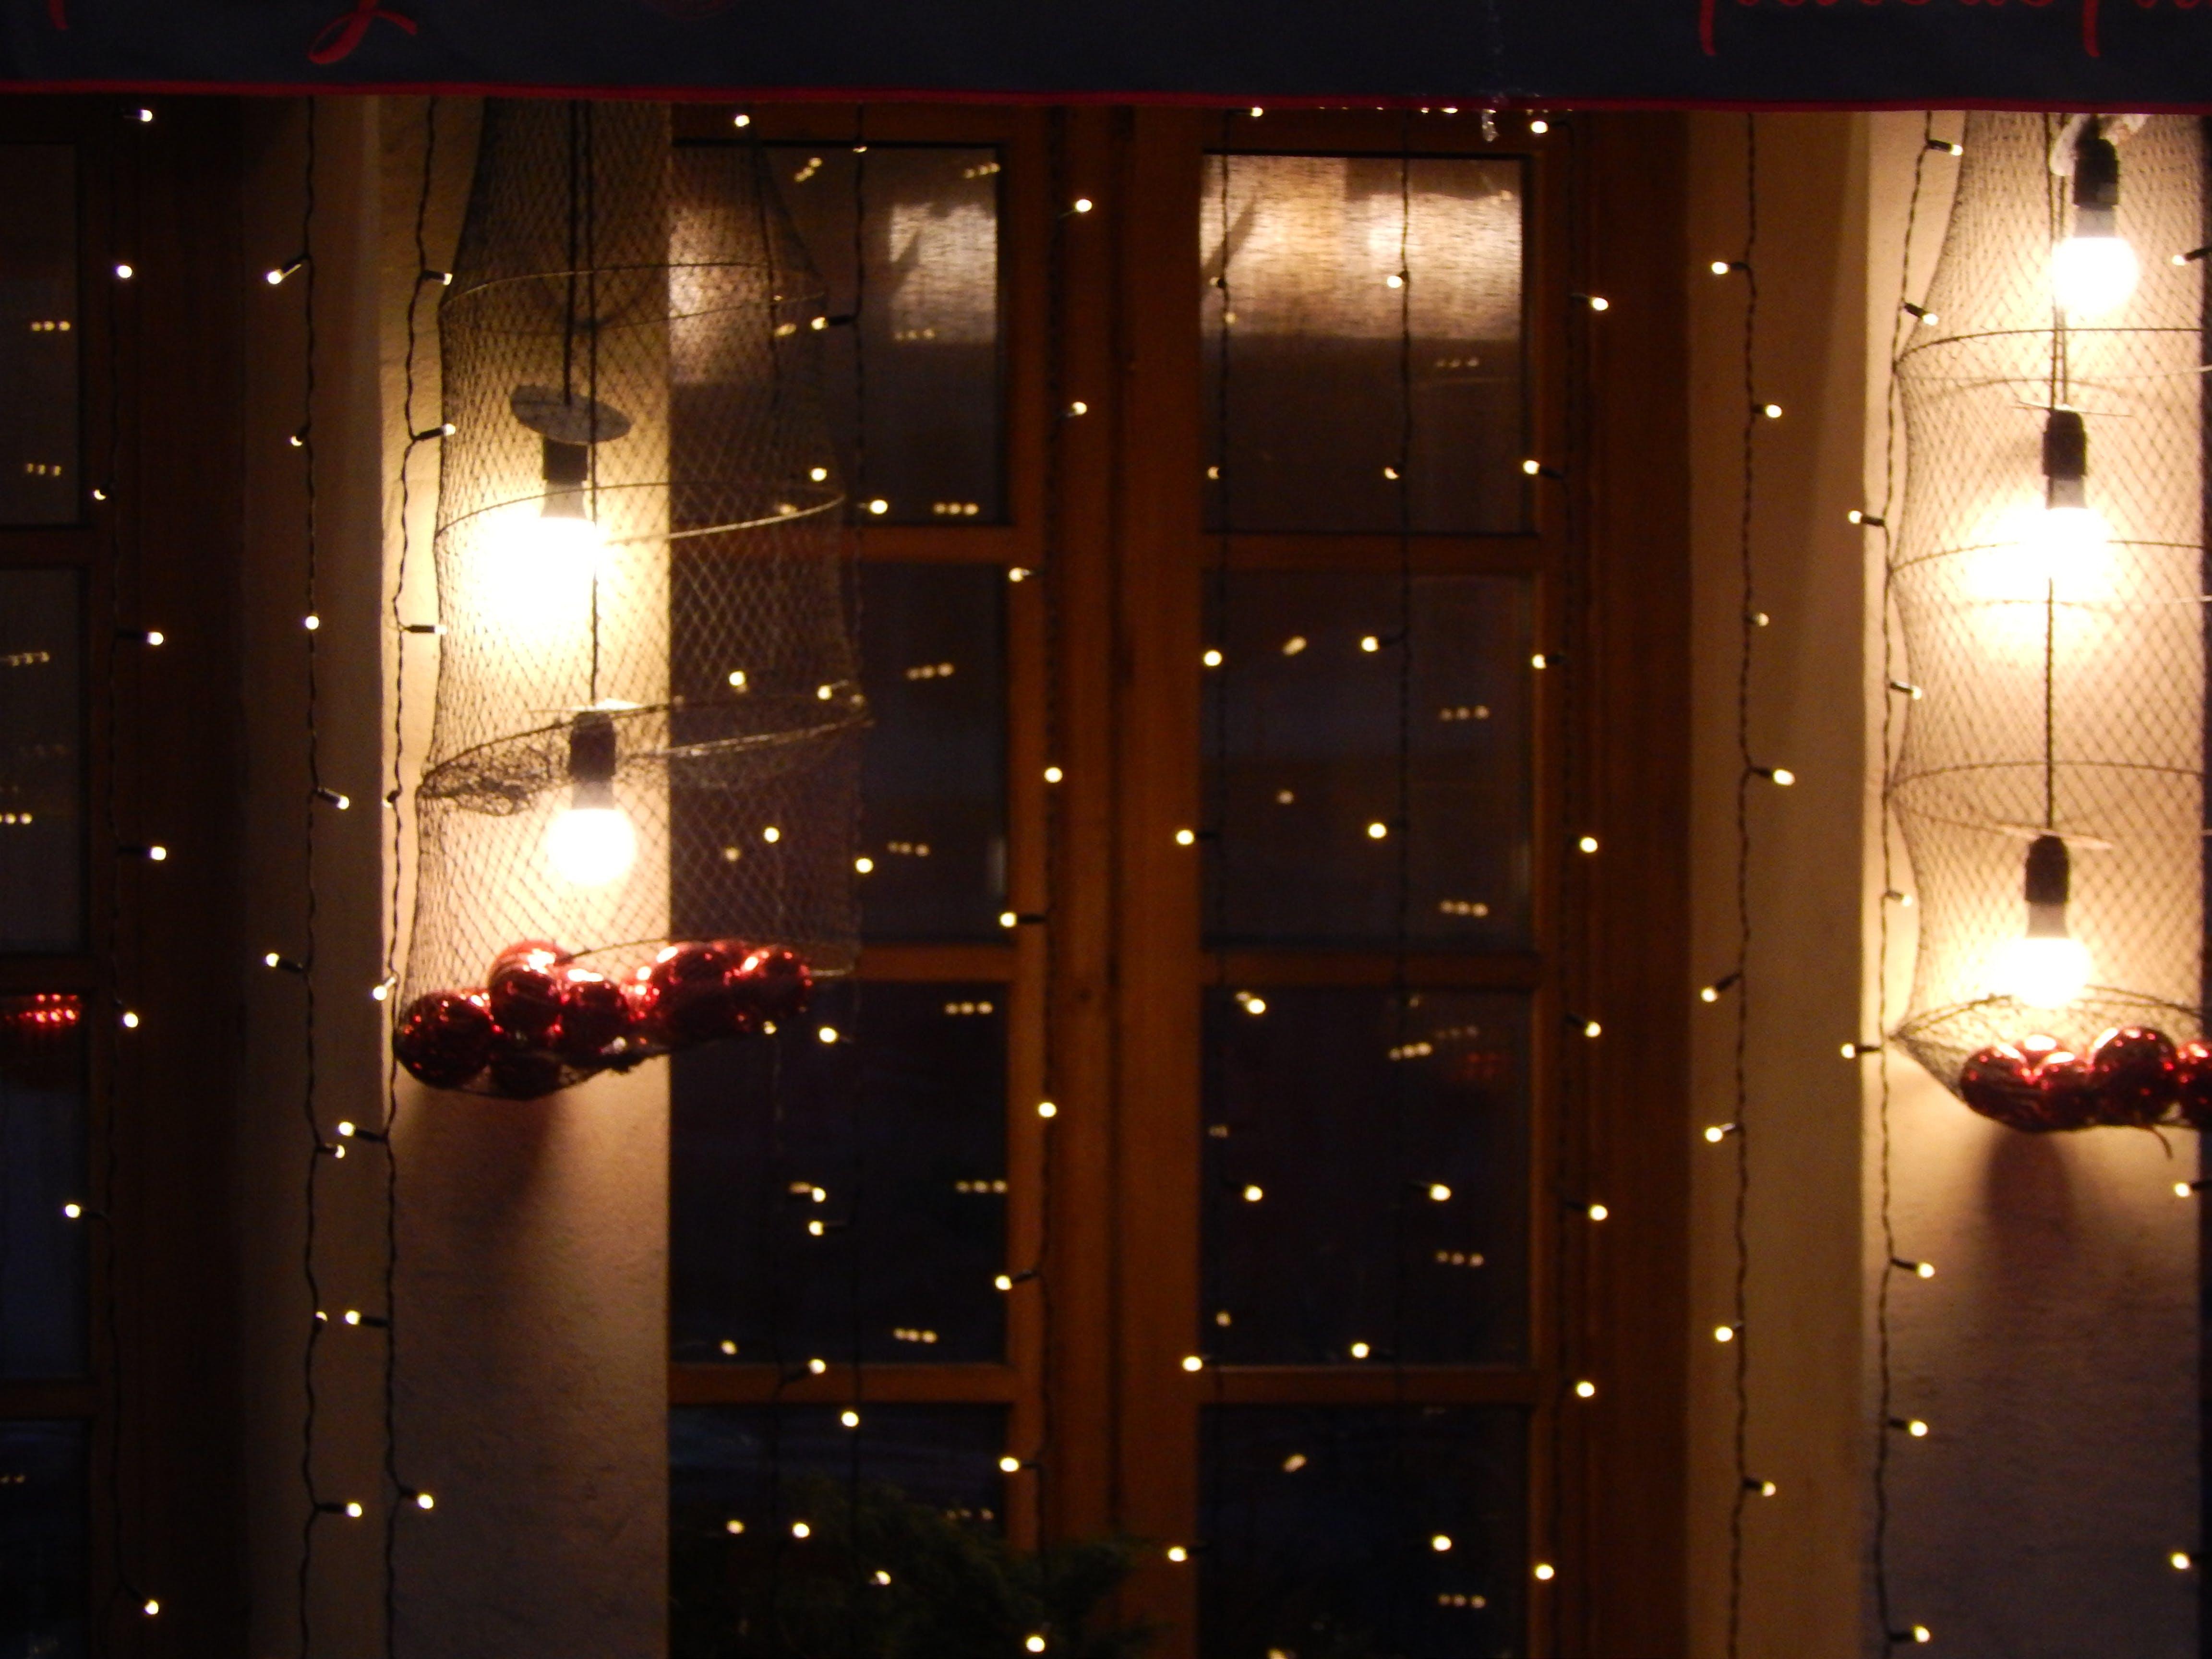 Free stock photo of background, celebrate, celebration, champagne